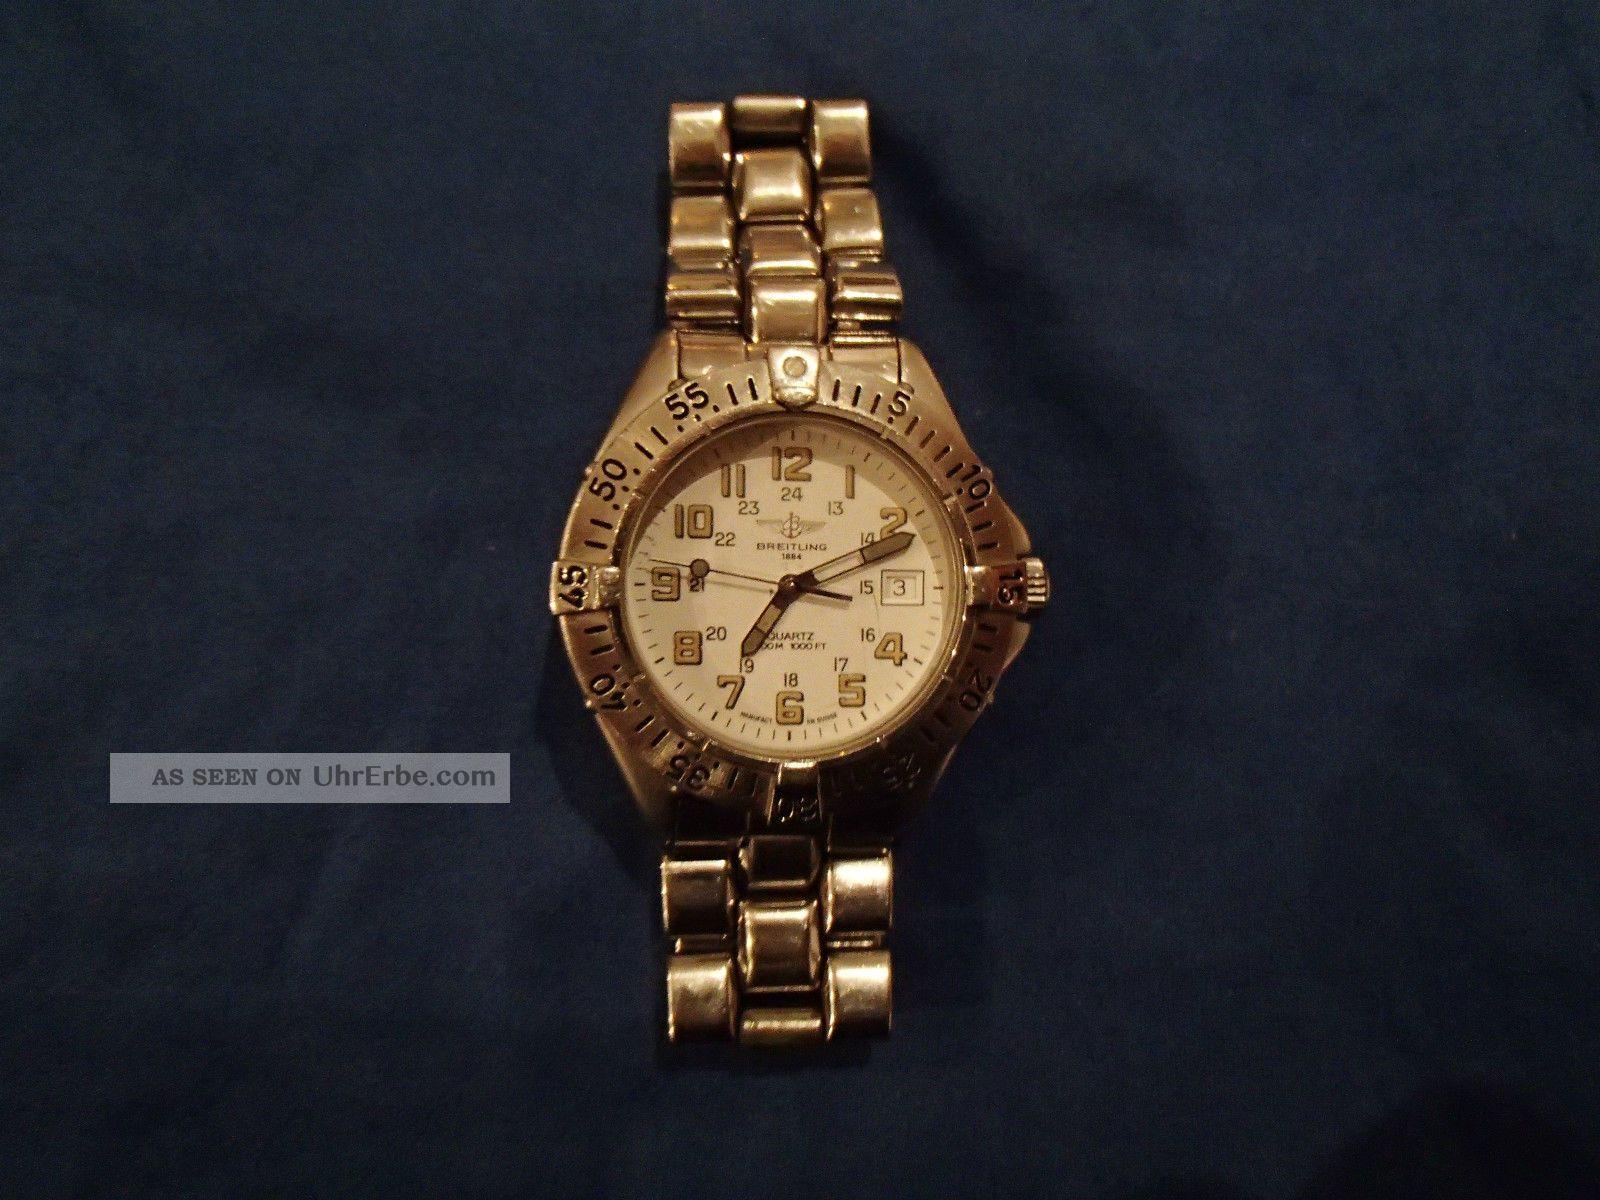 Breitling Colt Quartz Uhr Klassiker Weiss Stahlarmband Armbanduhren Bild